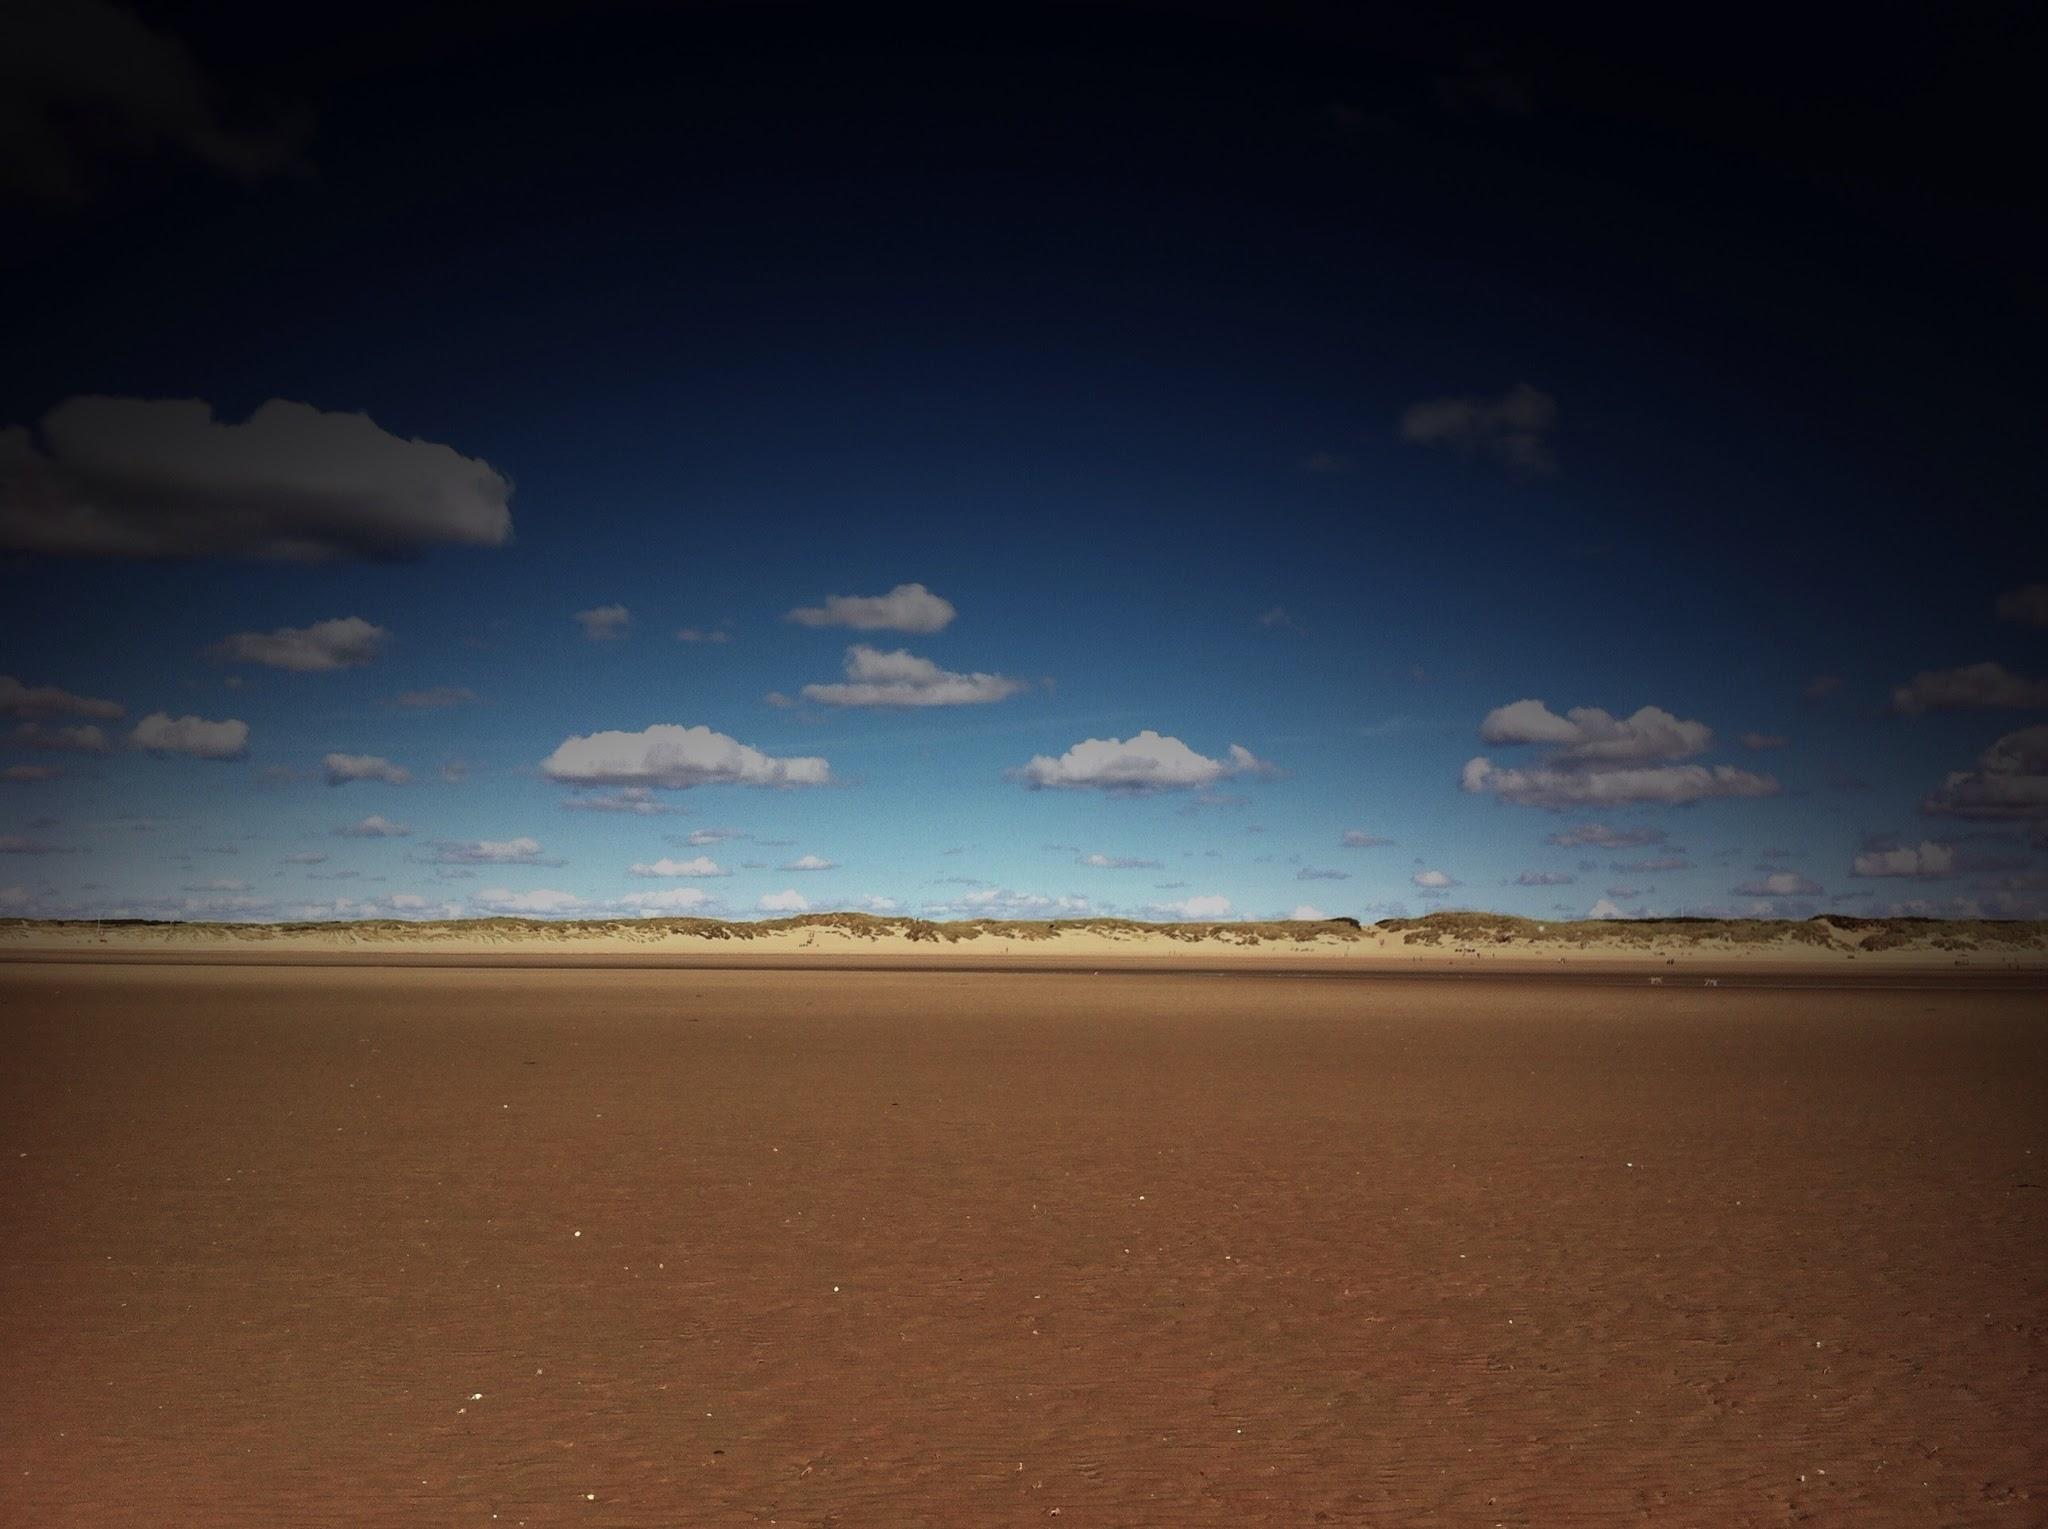 空の壁紙:青空の壁紙画像